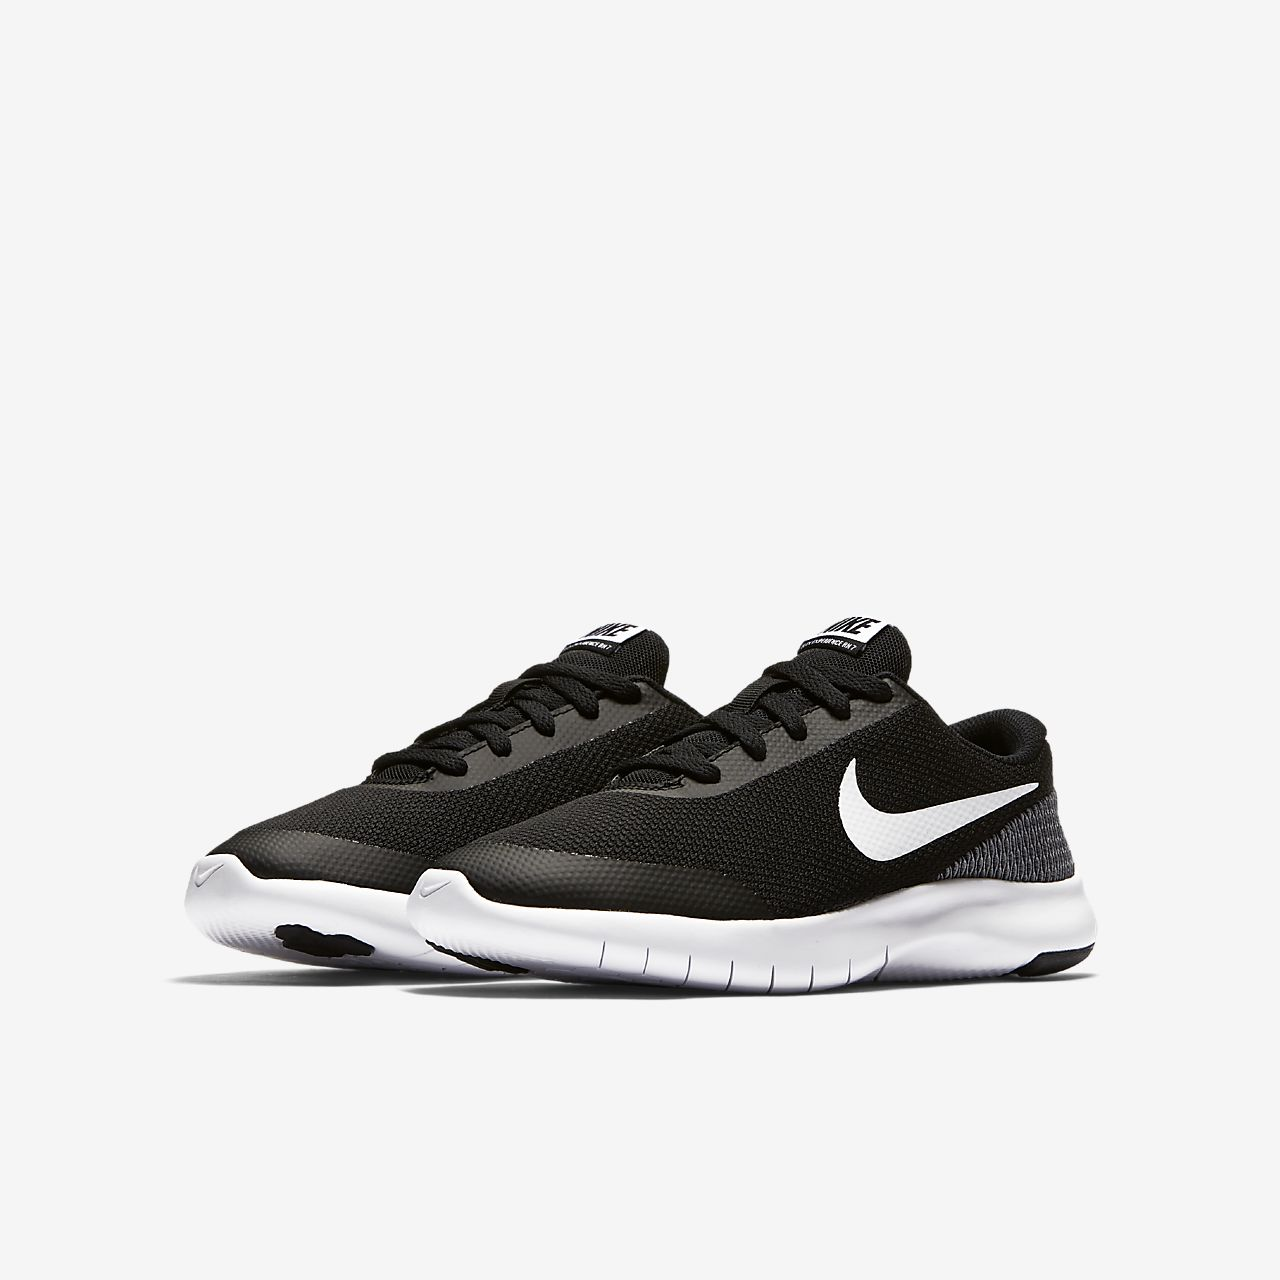 c60051492 Nike Flex Experience Run 7 Zapatillas de running - Niño a. Nike.com ES